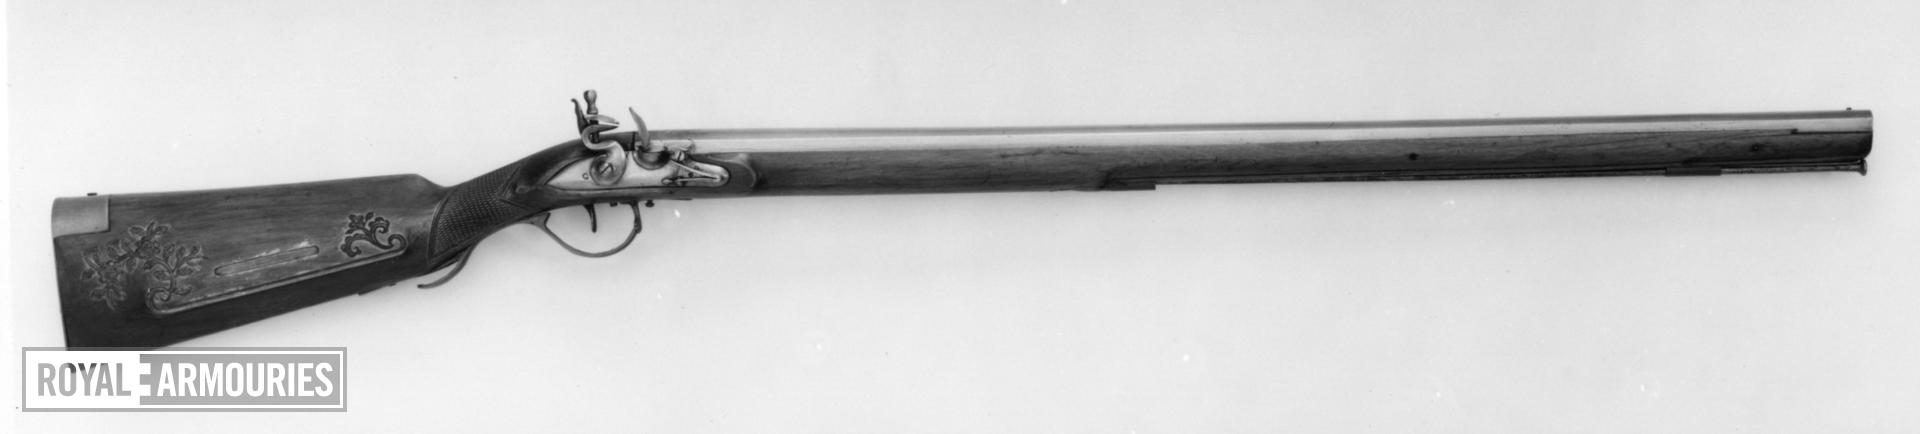 Flintlock muzzleloading musket - Trade Musket